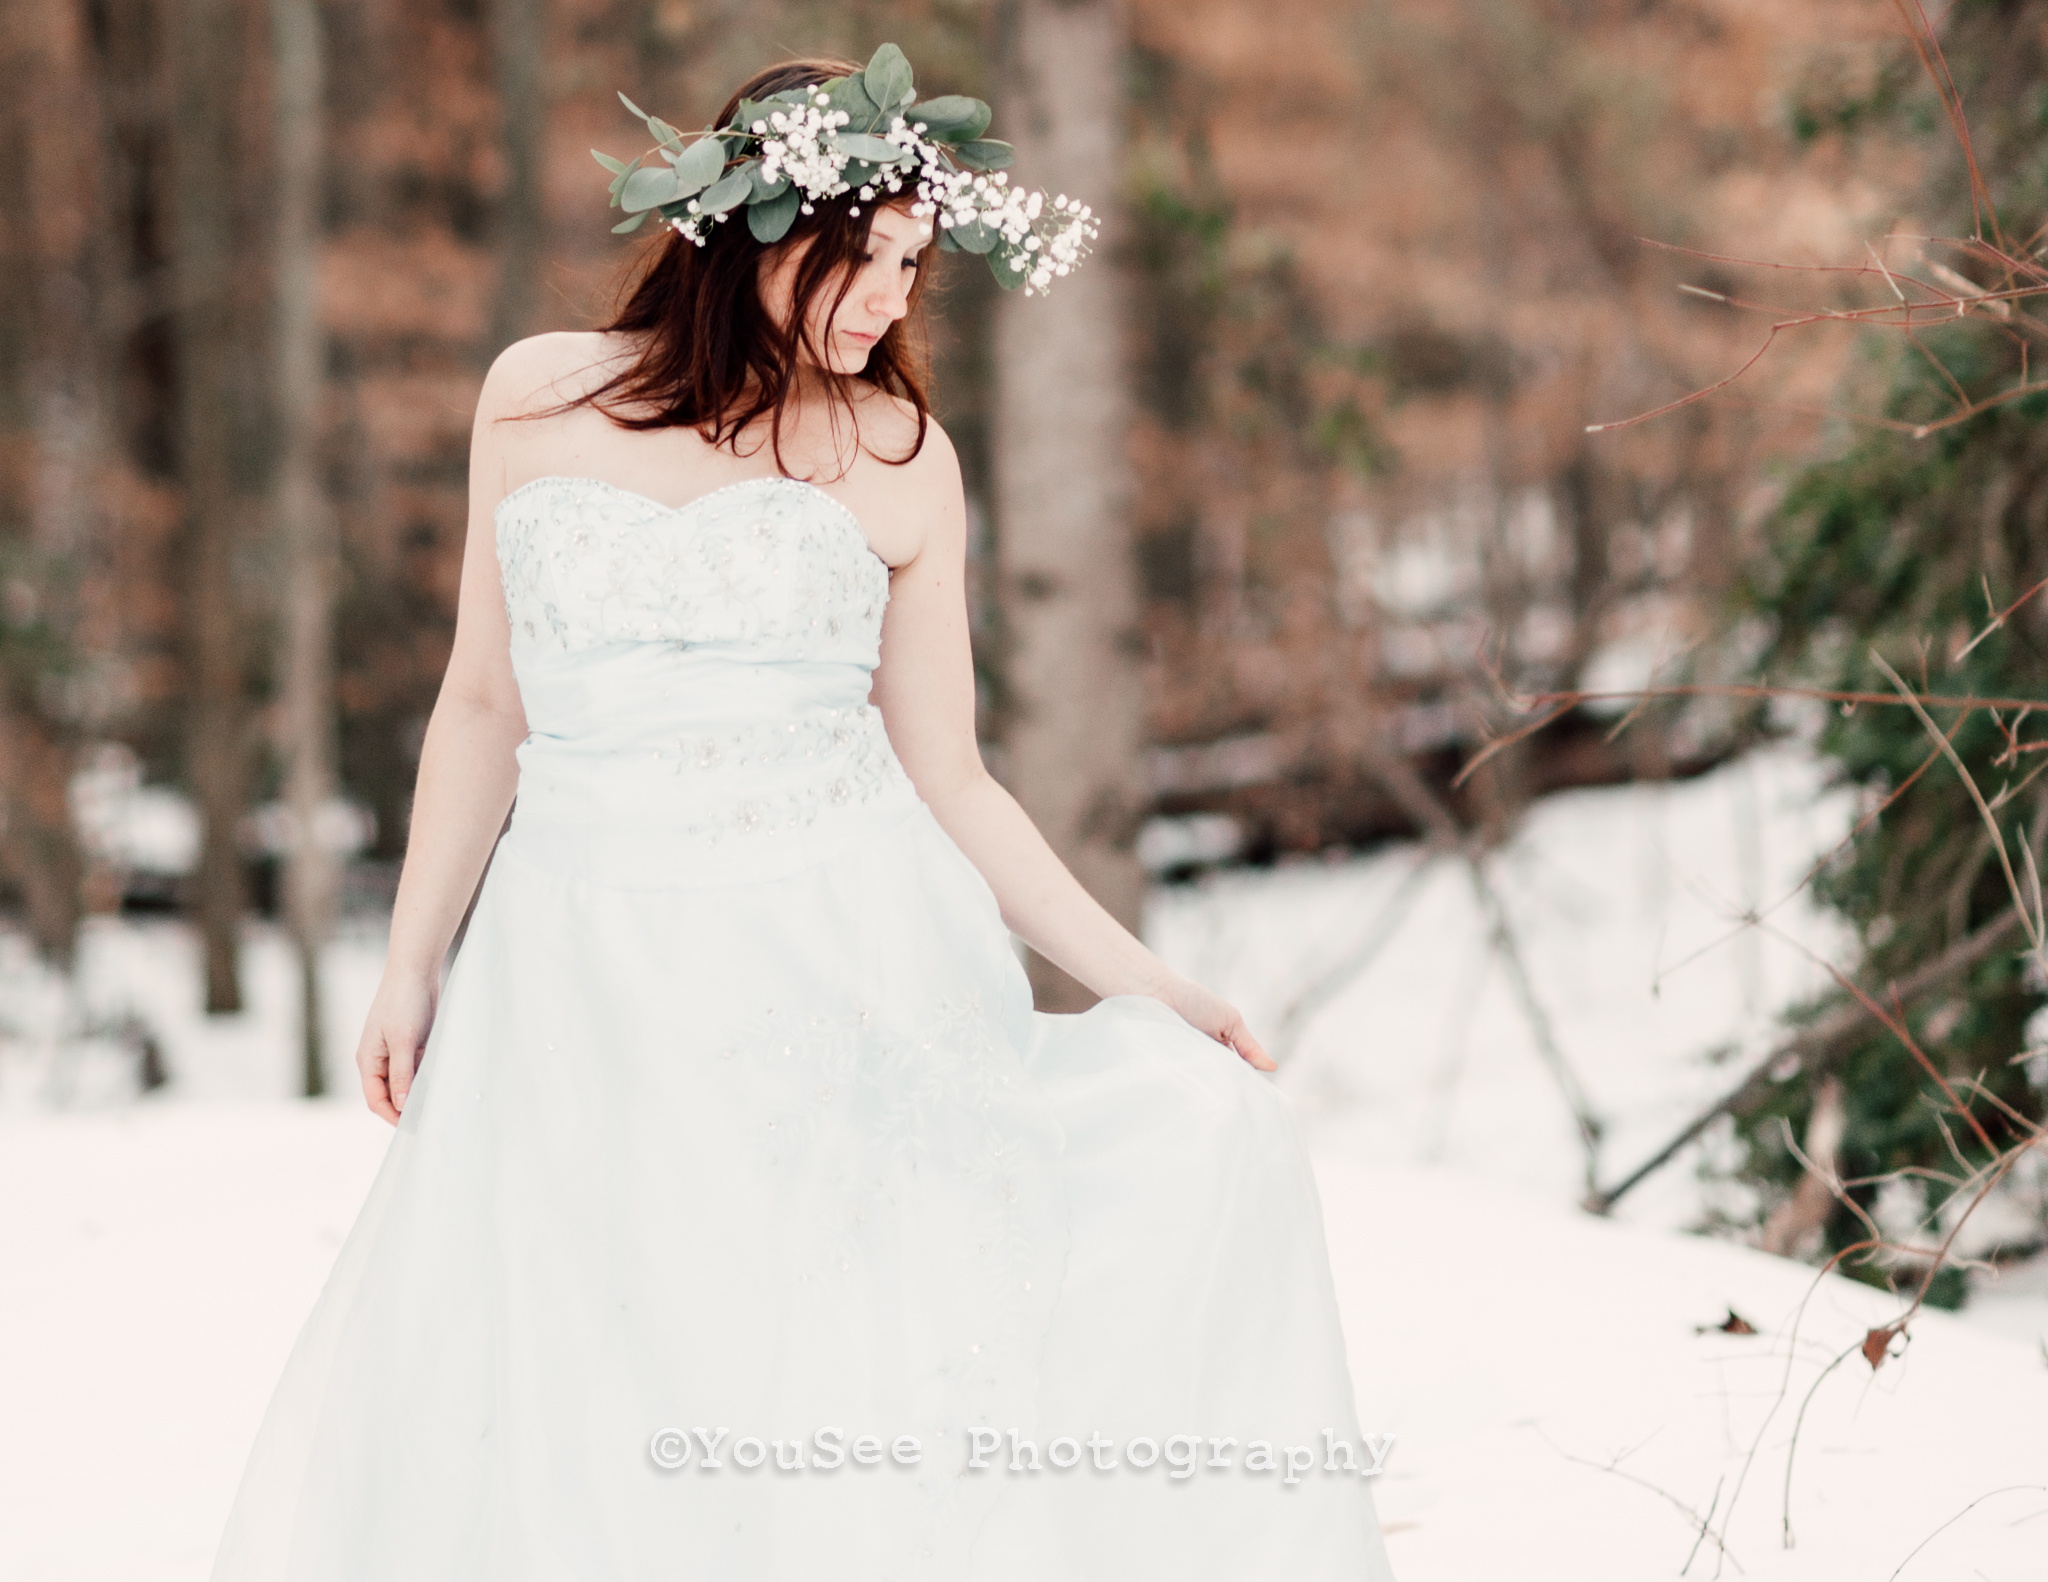 seniorportrait_fredericksburg_photography_winter2 (26)